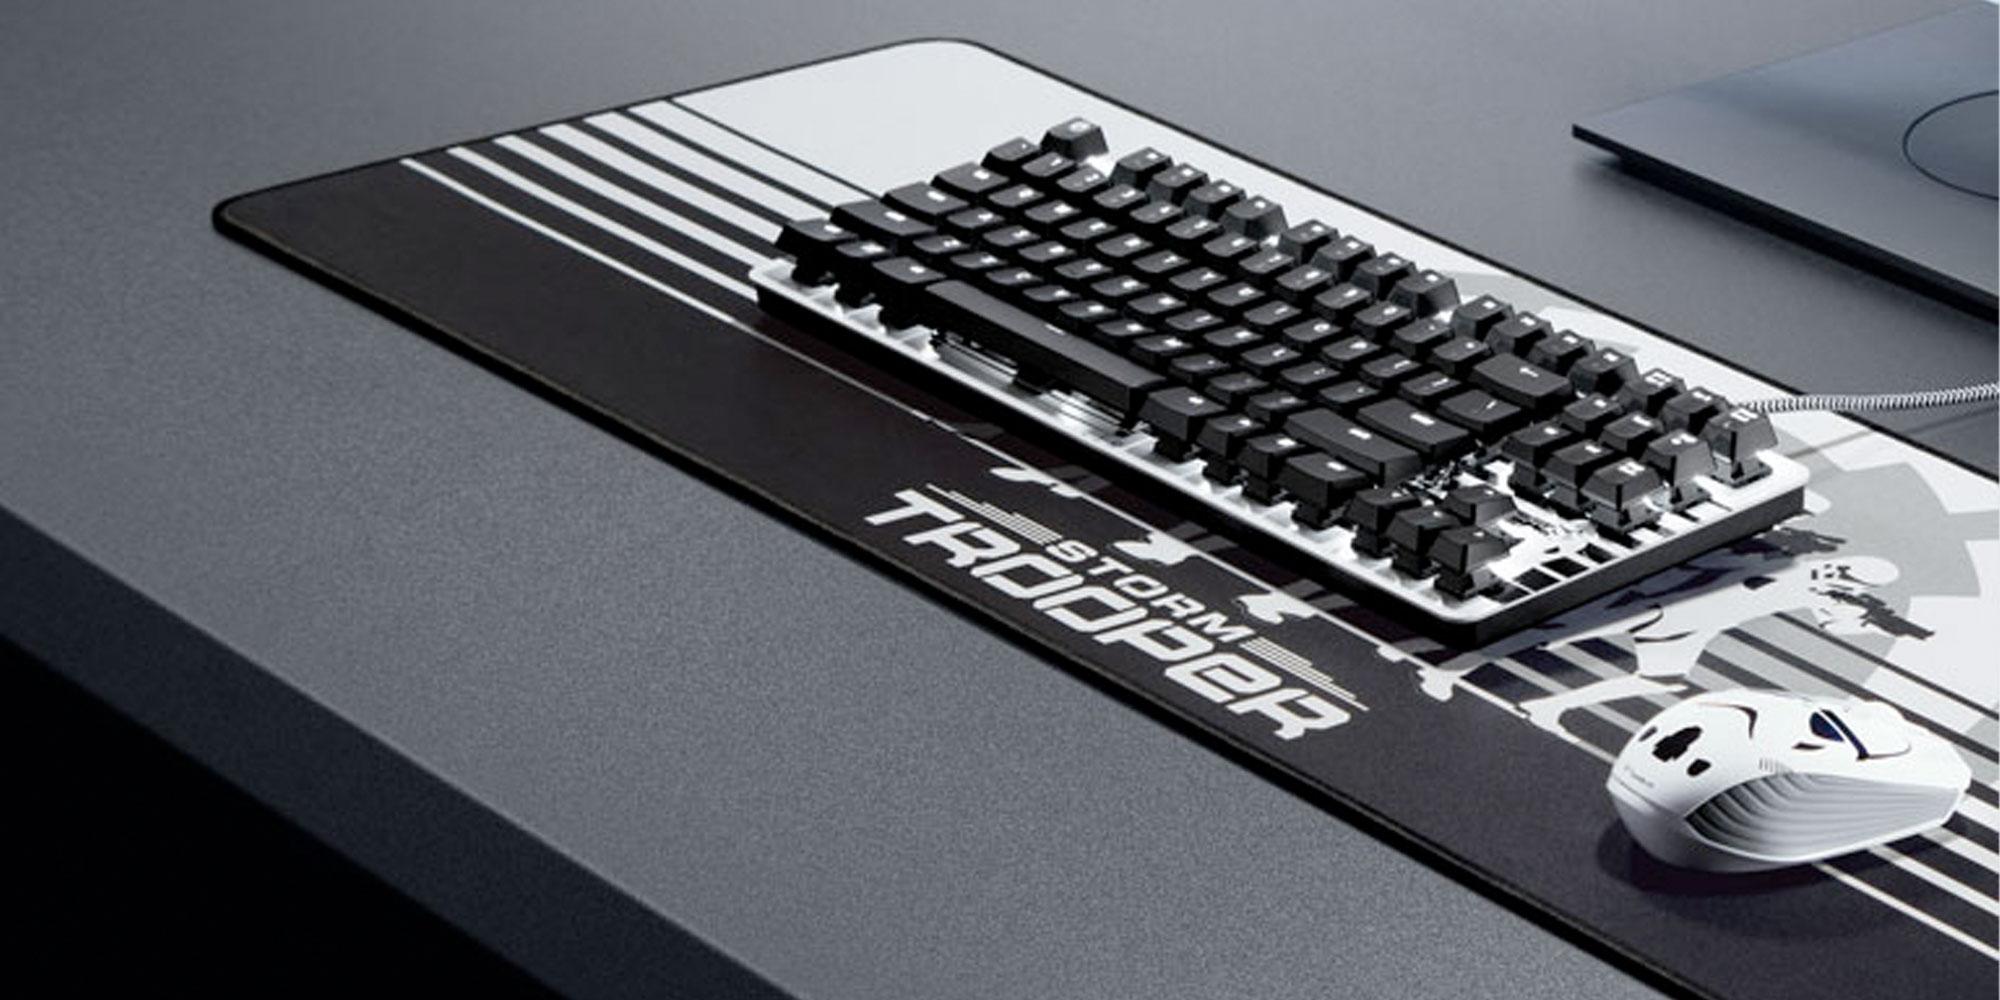 razer stormtrooper edition keyboard